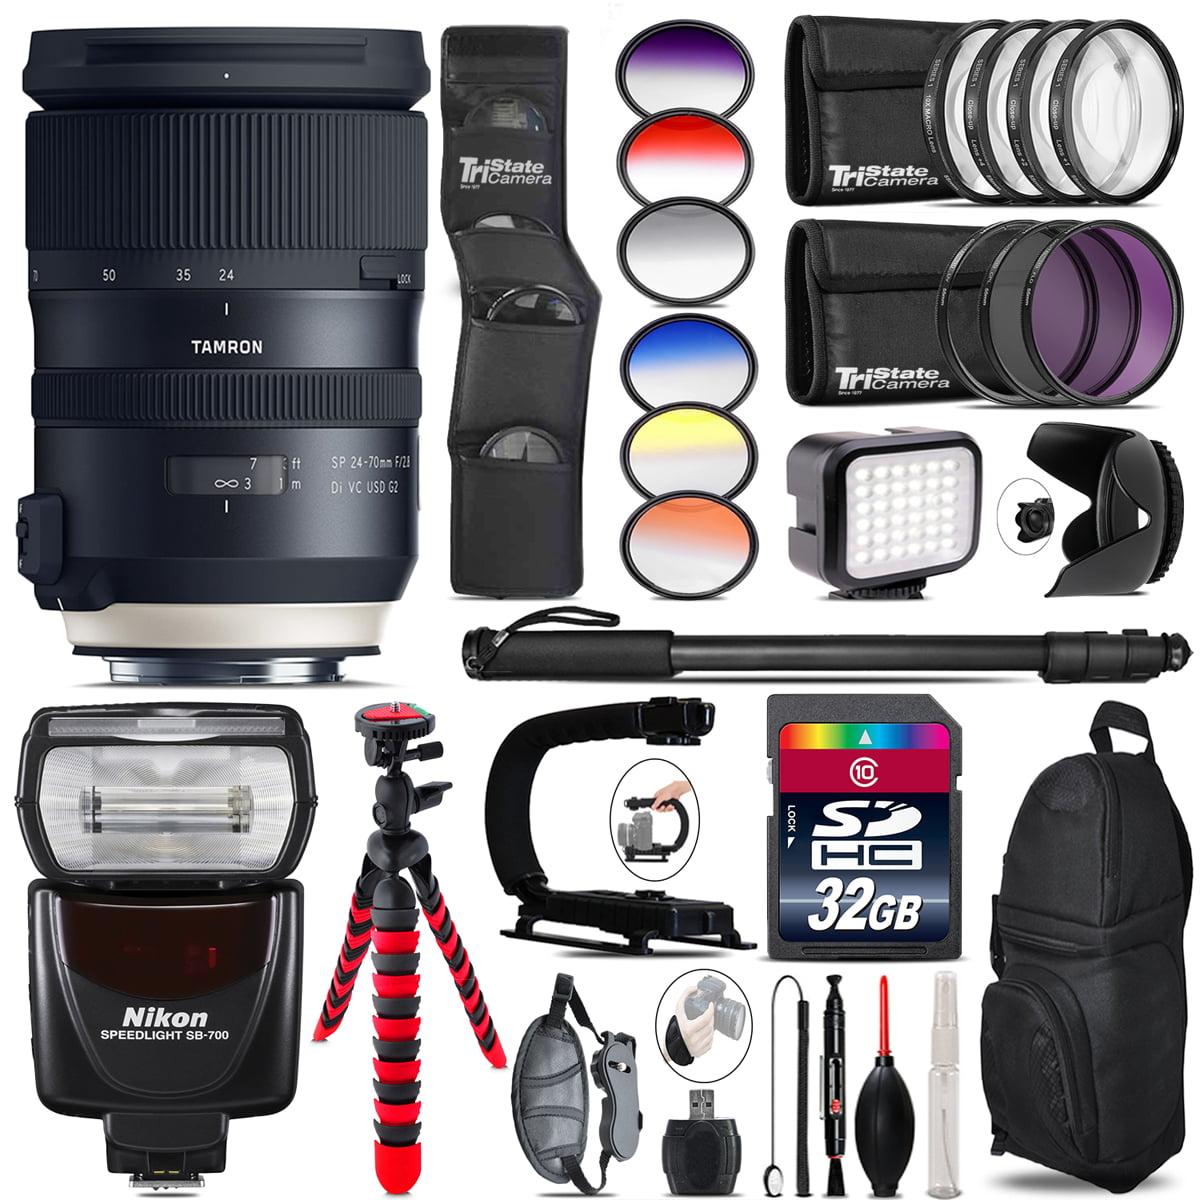 Tamron 24-70mm VC G2 for Nikon + SB-700 AF Speedlight + LED 32GB Accessory Kit by TriStateCamera